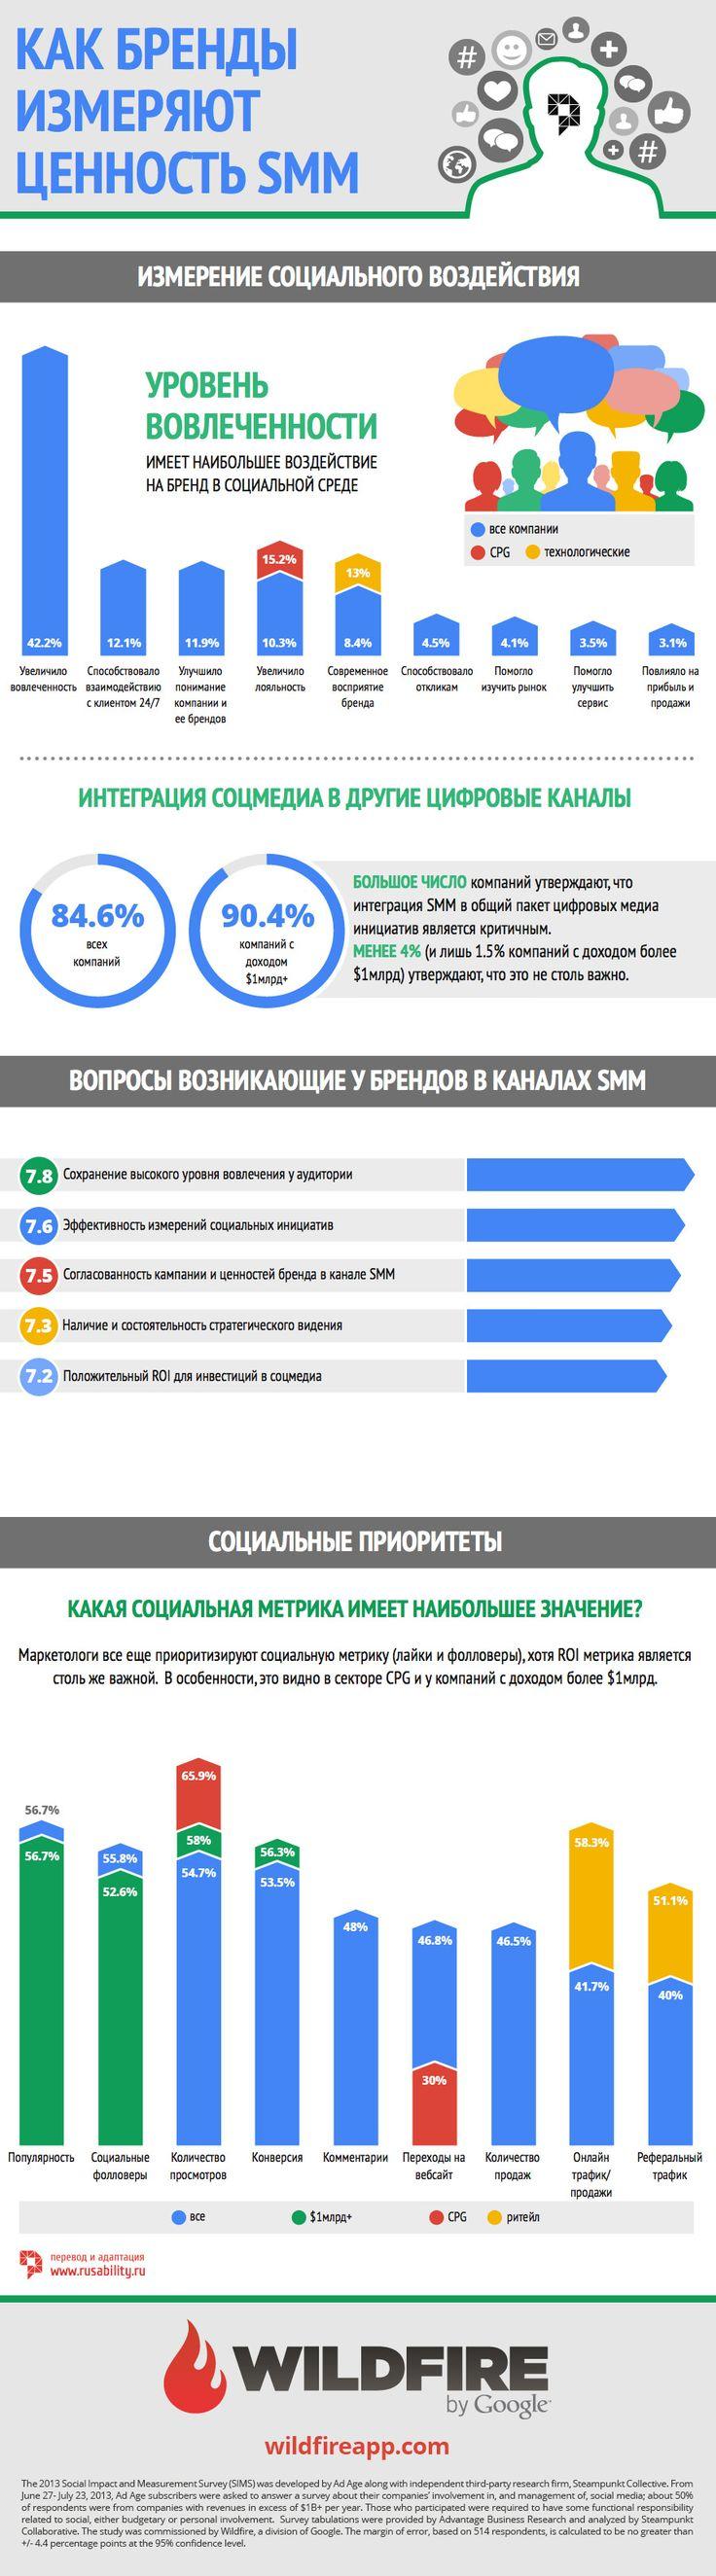 smm, инфографика, брендинг, бренды, соцсети, соцмедиа, исследование, метрика, интернет-маркетинг